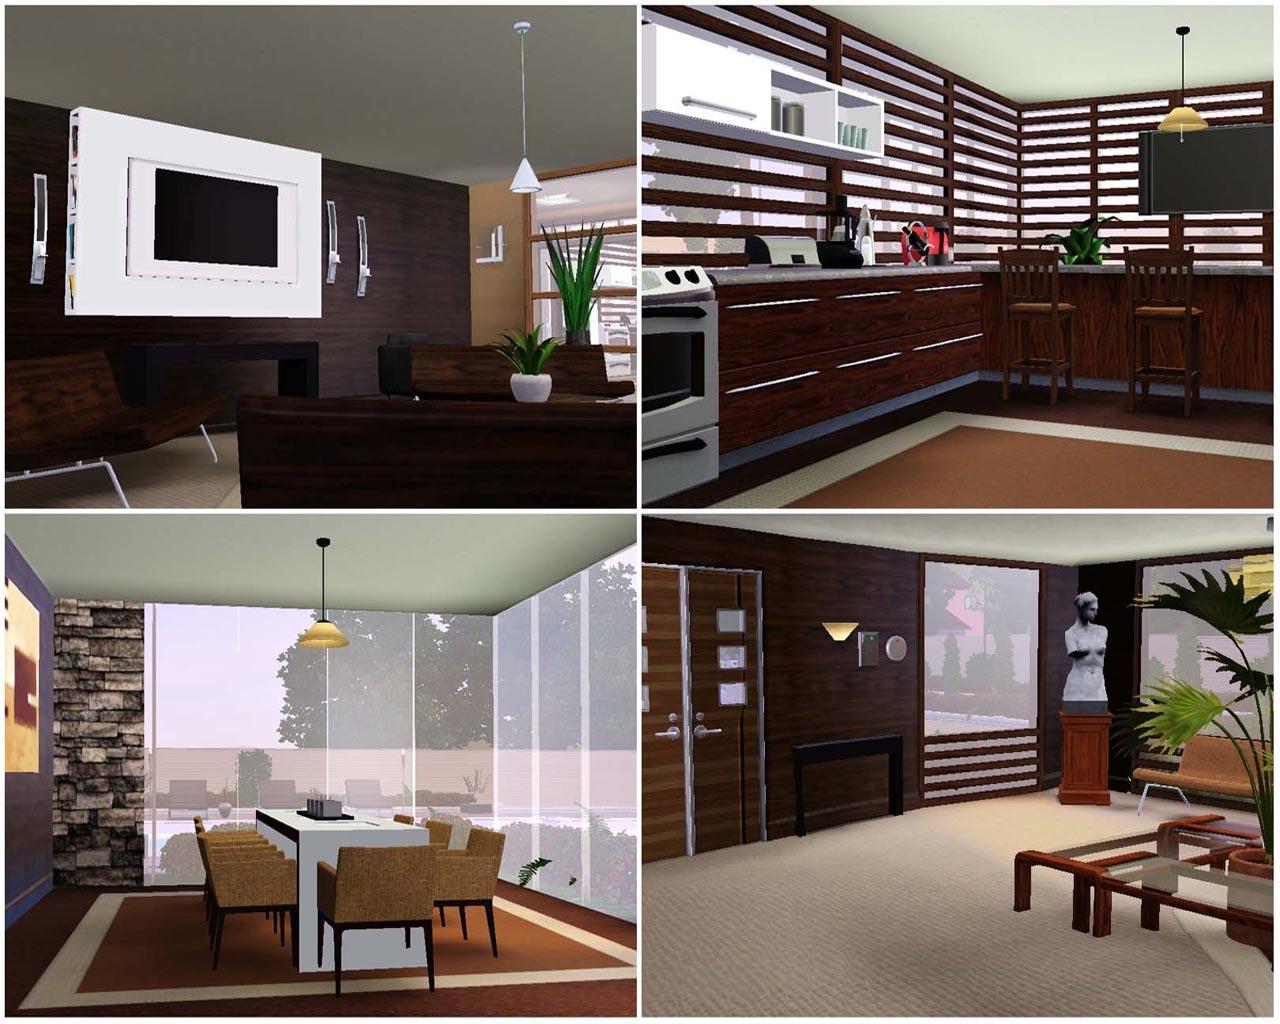 Mod the sims arkana paradise modern house for Sims interior designs 1